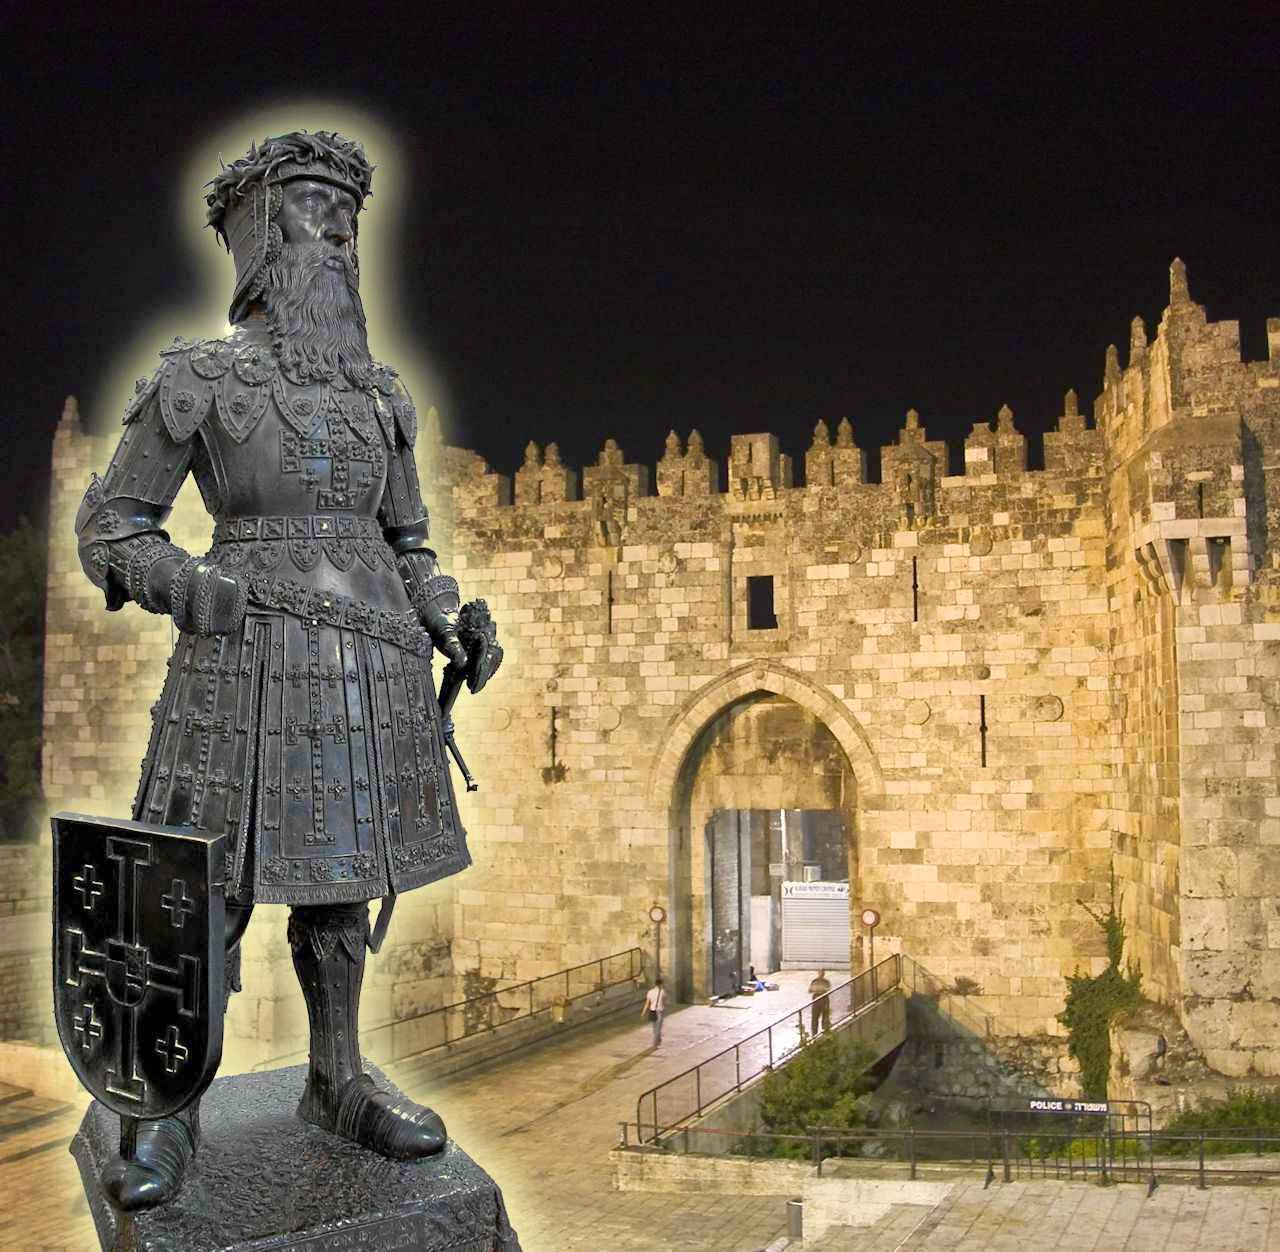 Godofredo de Bouillon. Fundo: Puerta de Damasco em Jerusalém.